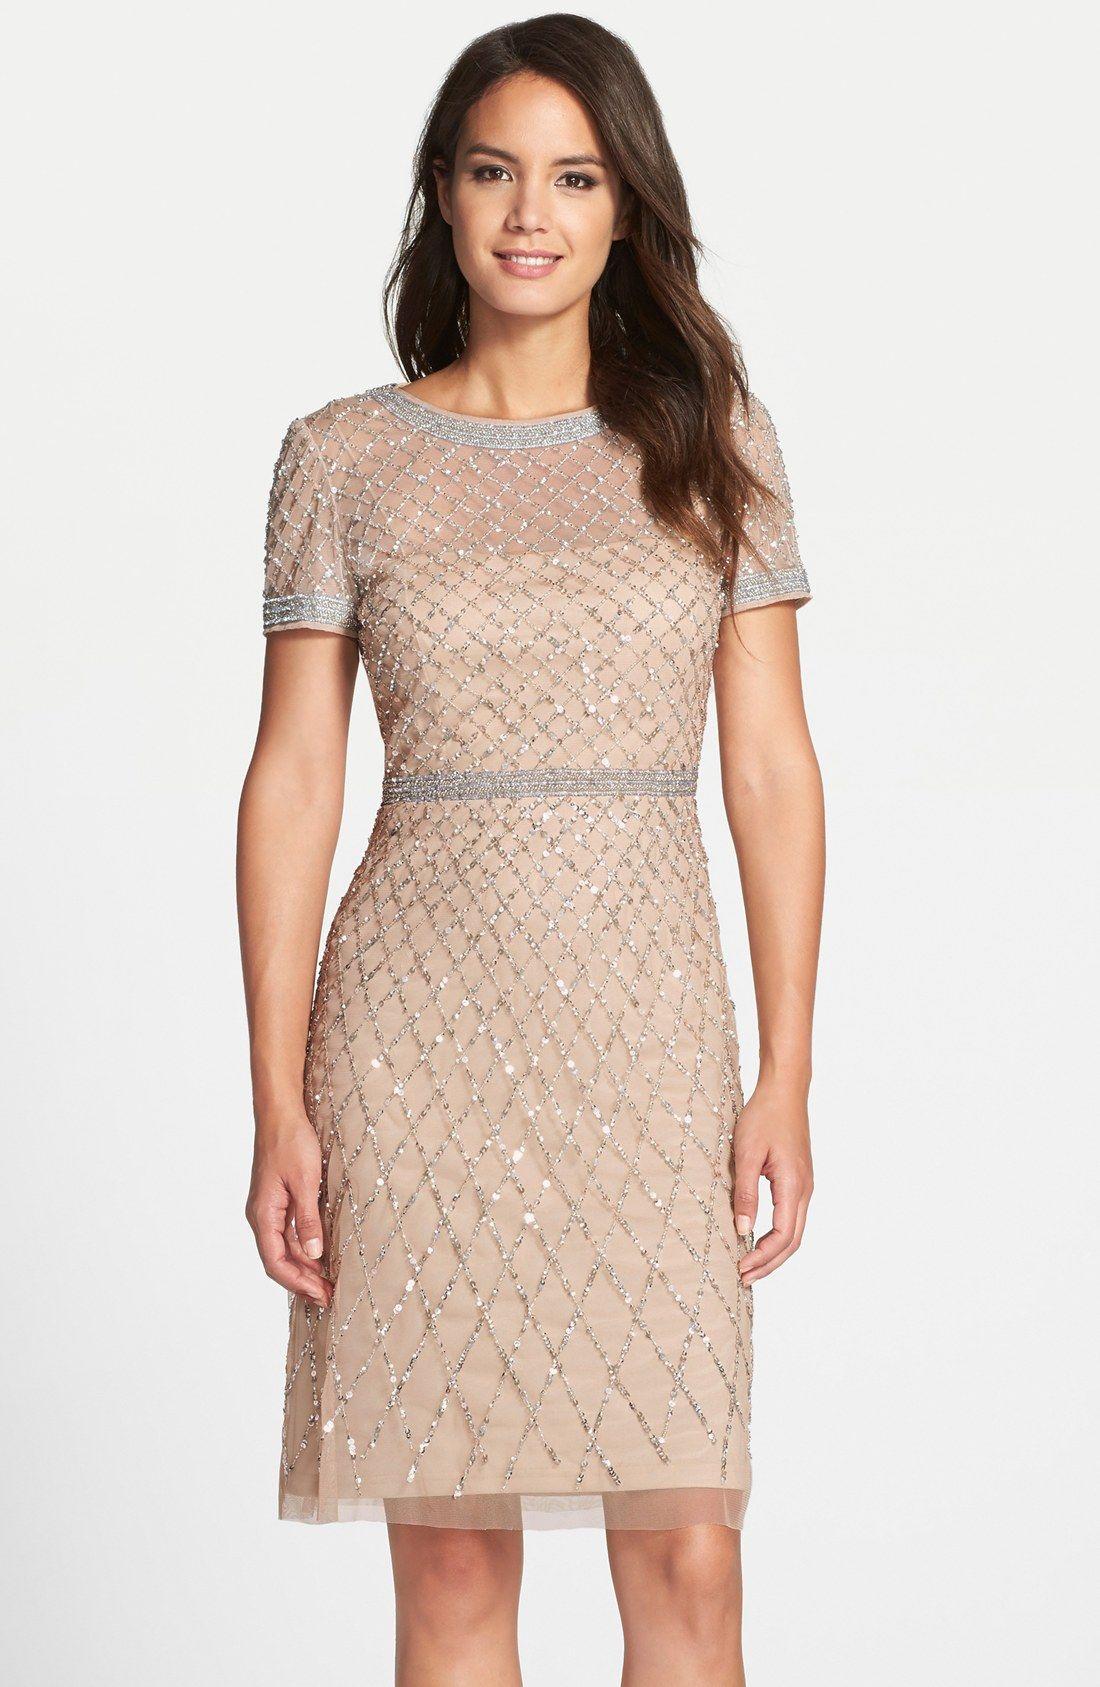 Adrianna Papell Beaded Woven Sheath Dress Regular Petite Nordstrom Beaded Dress Short Petite Cocktail Dresses Dresses [ 1687 x 1100 Pixel ]